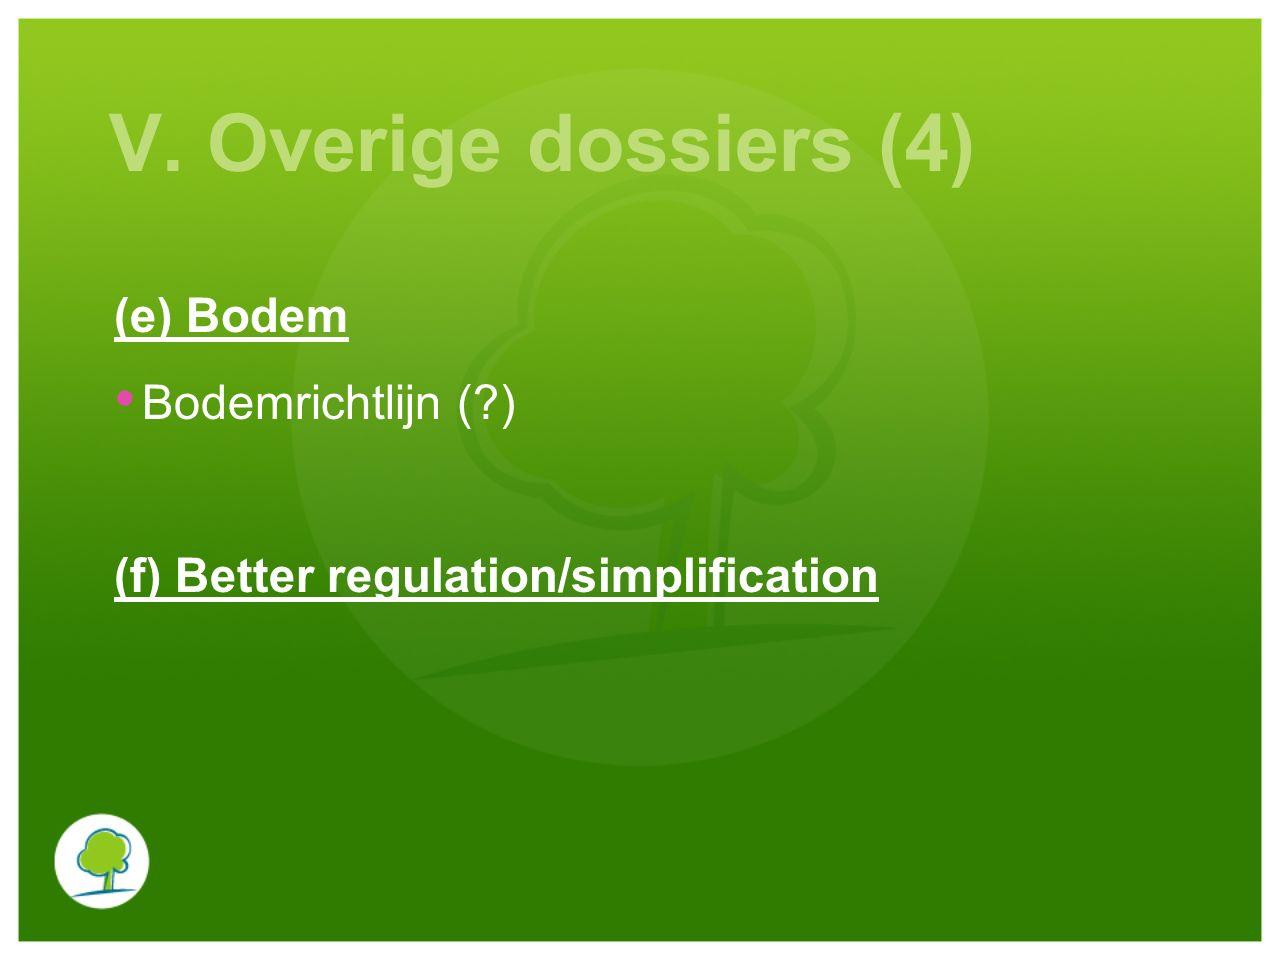 V. Overige dossiers (4) (e) Bodem Bodemrichtlijn (?) (f) Better regulation/simplification